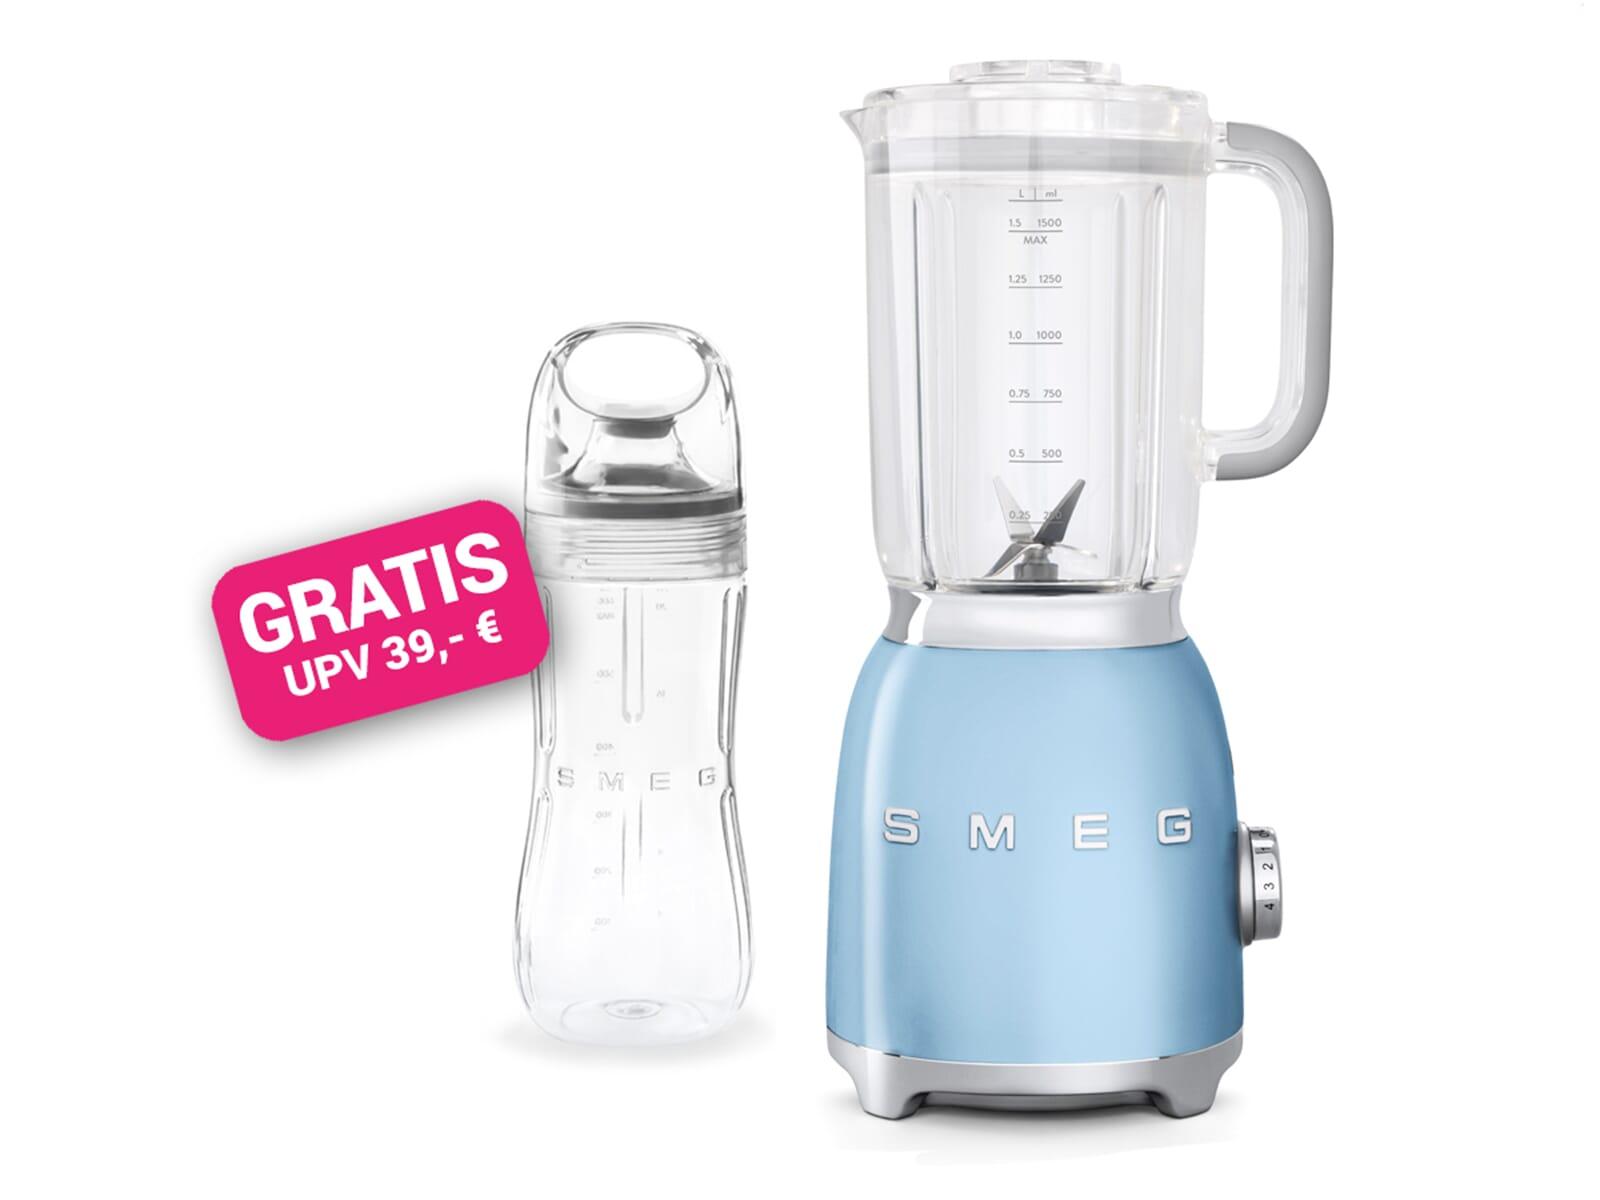 Smeg Kühlschrank Pastellblau : Smeg blf pbeu standmixer pastellblau inkl gratis trinkflasche bgf